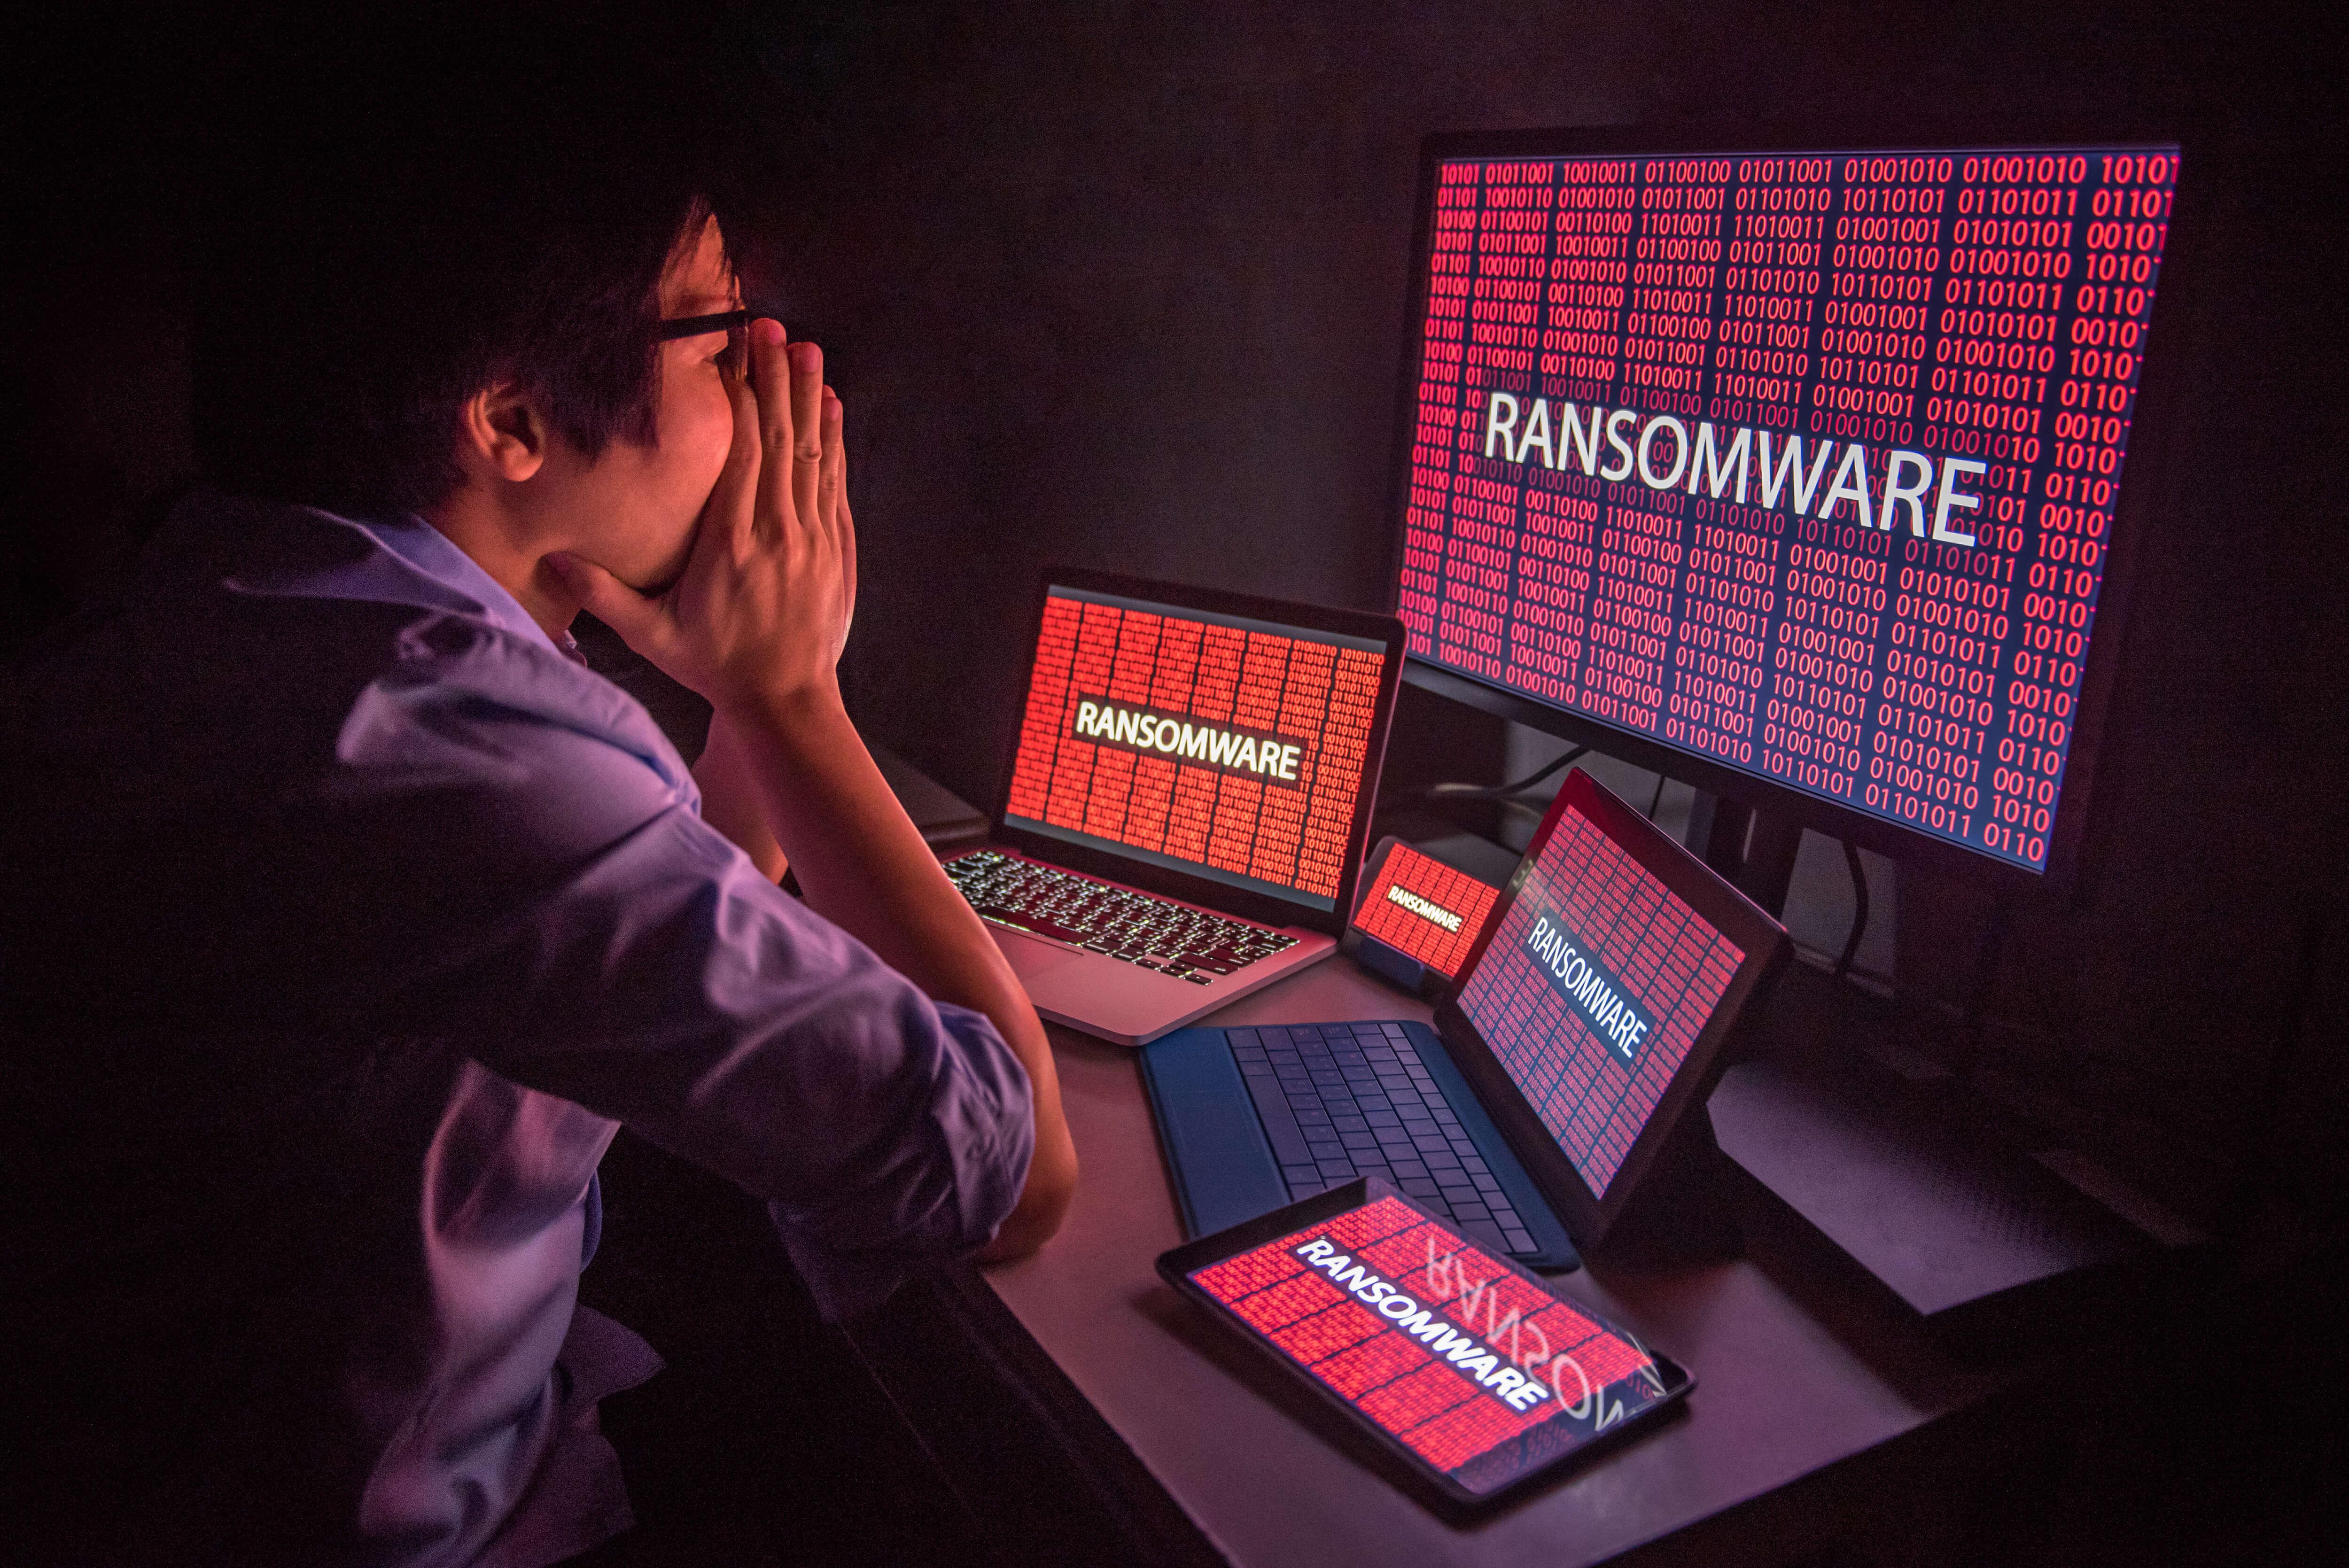 Ransomware moderno: